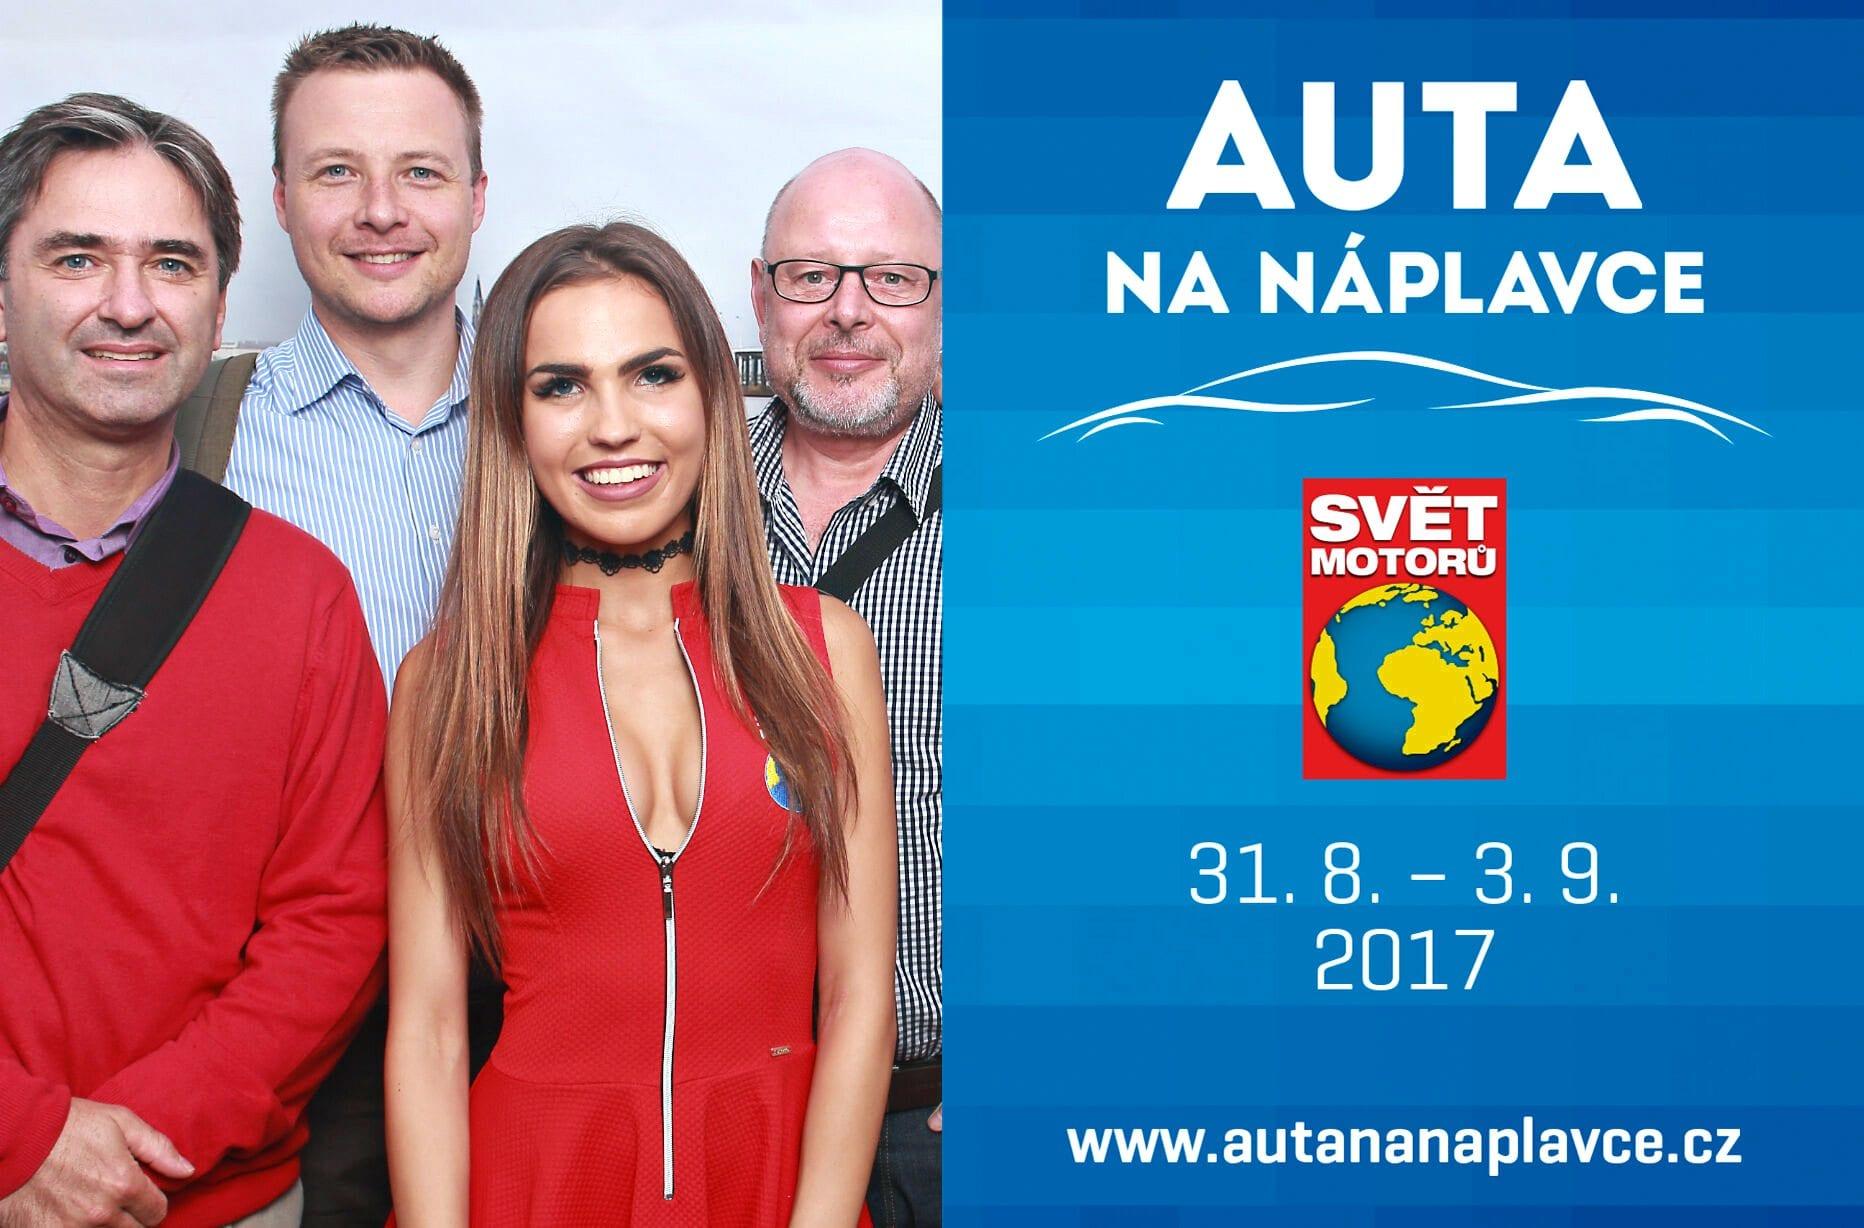 fotokoutek-auta-na-naplavce-31-8-2017-299698